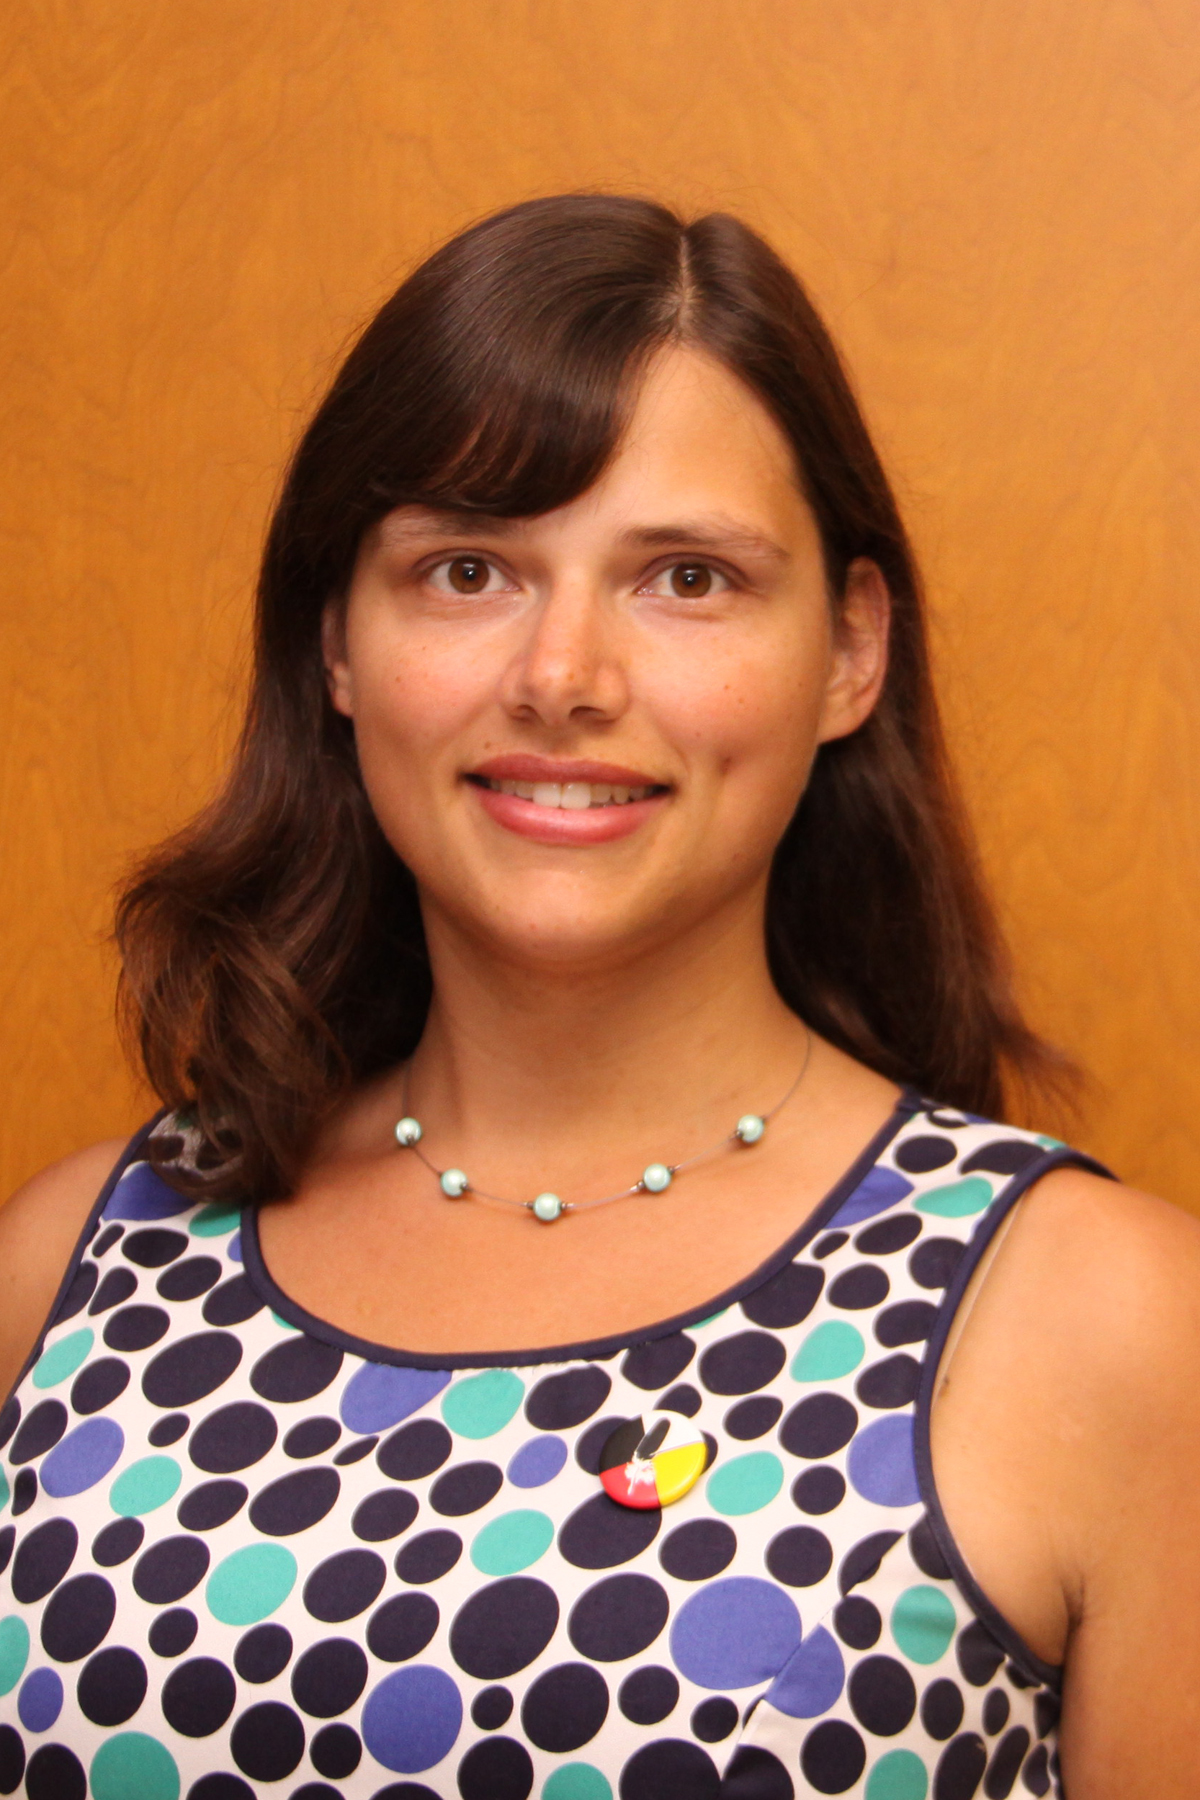 Lindsay Morcom (Saskatchewan & Exeter 2006)